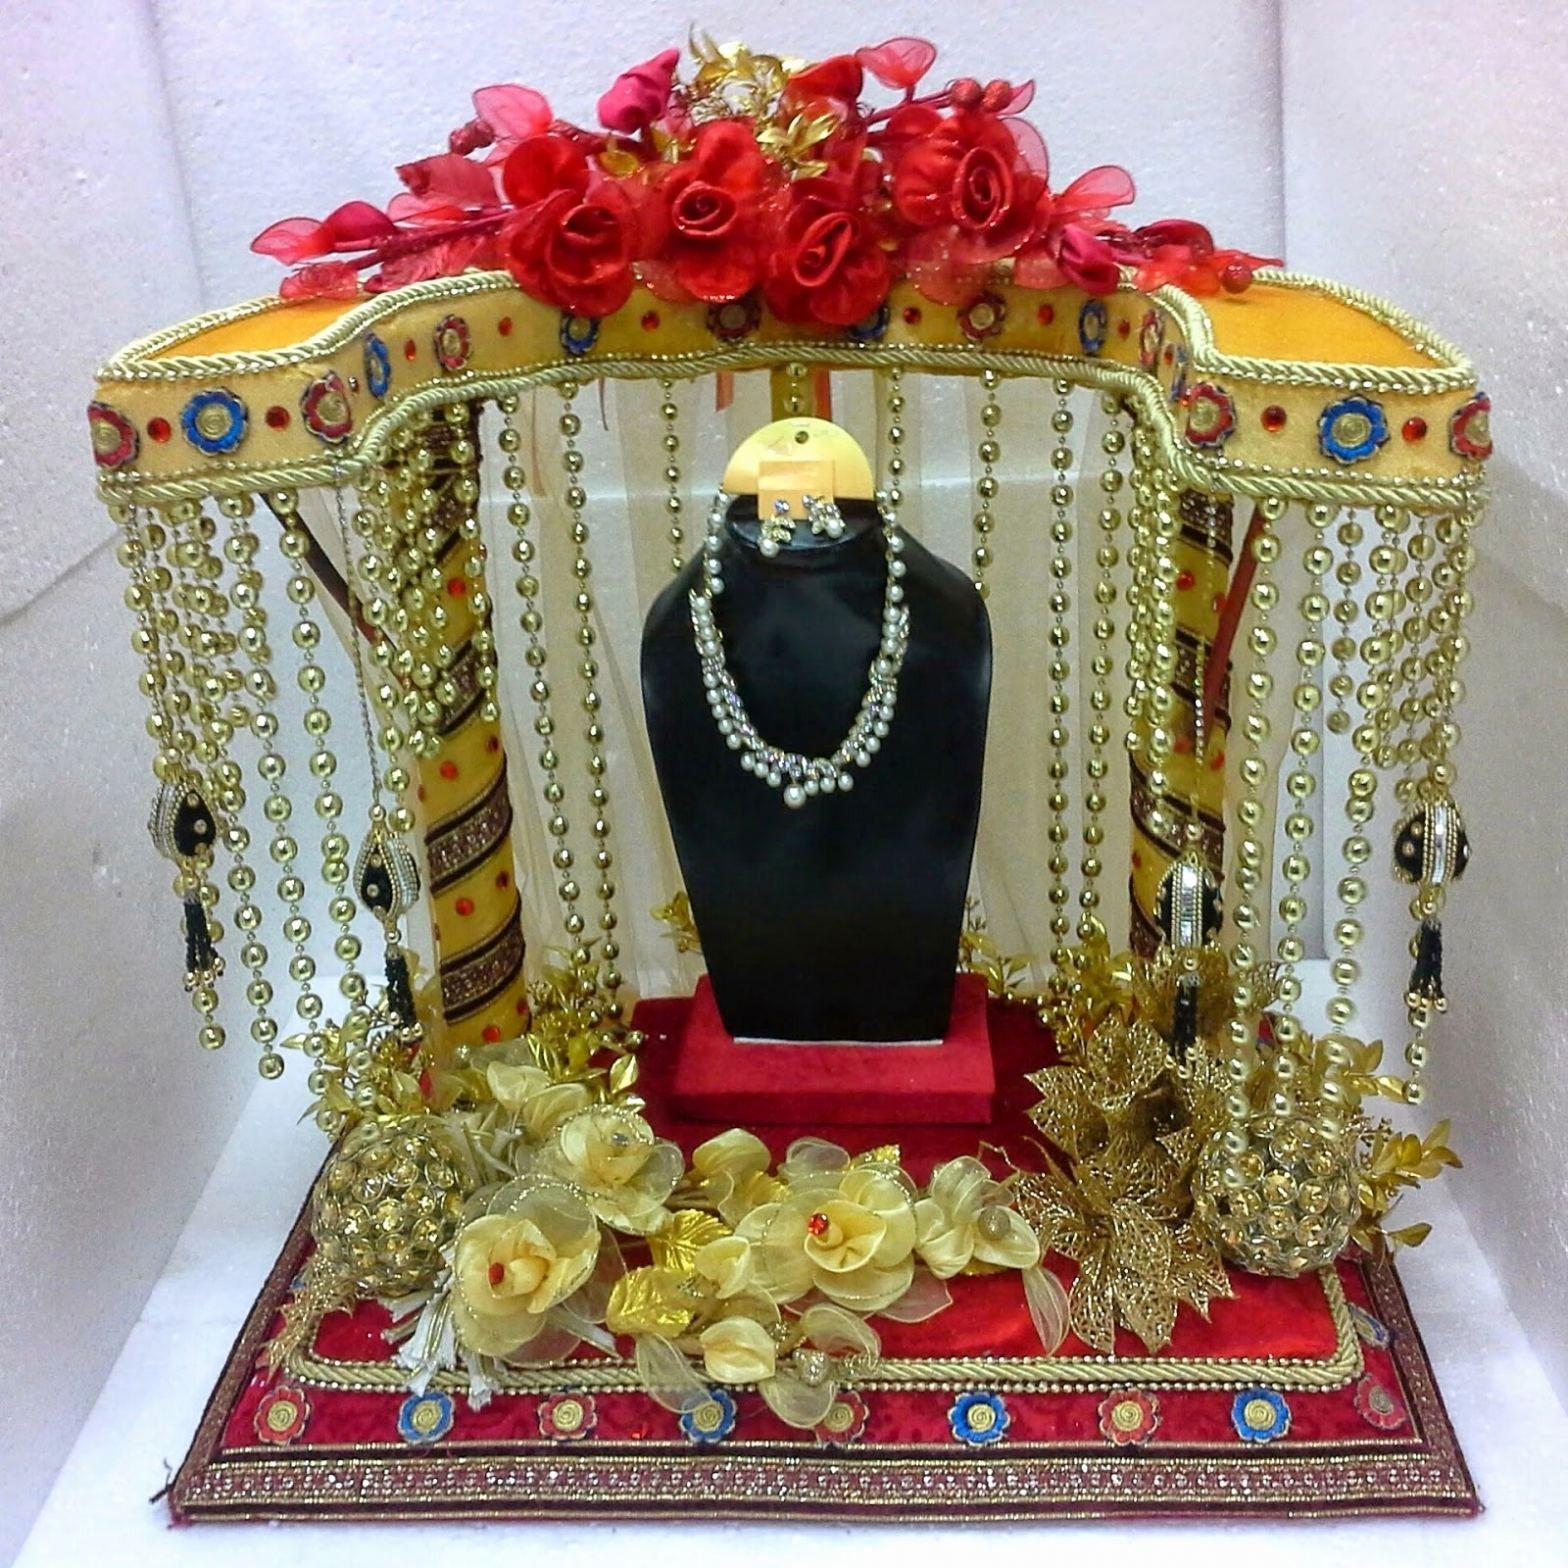 Superior Ideas For Indian Wedding Trays 5 Indian Wedding Tray